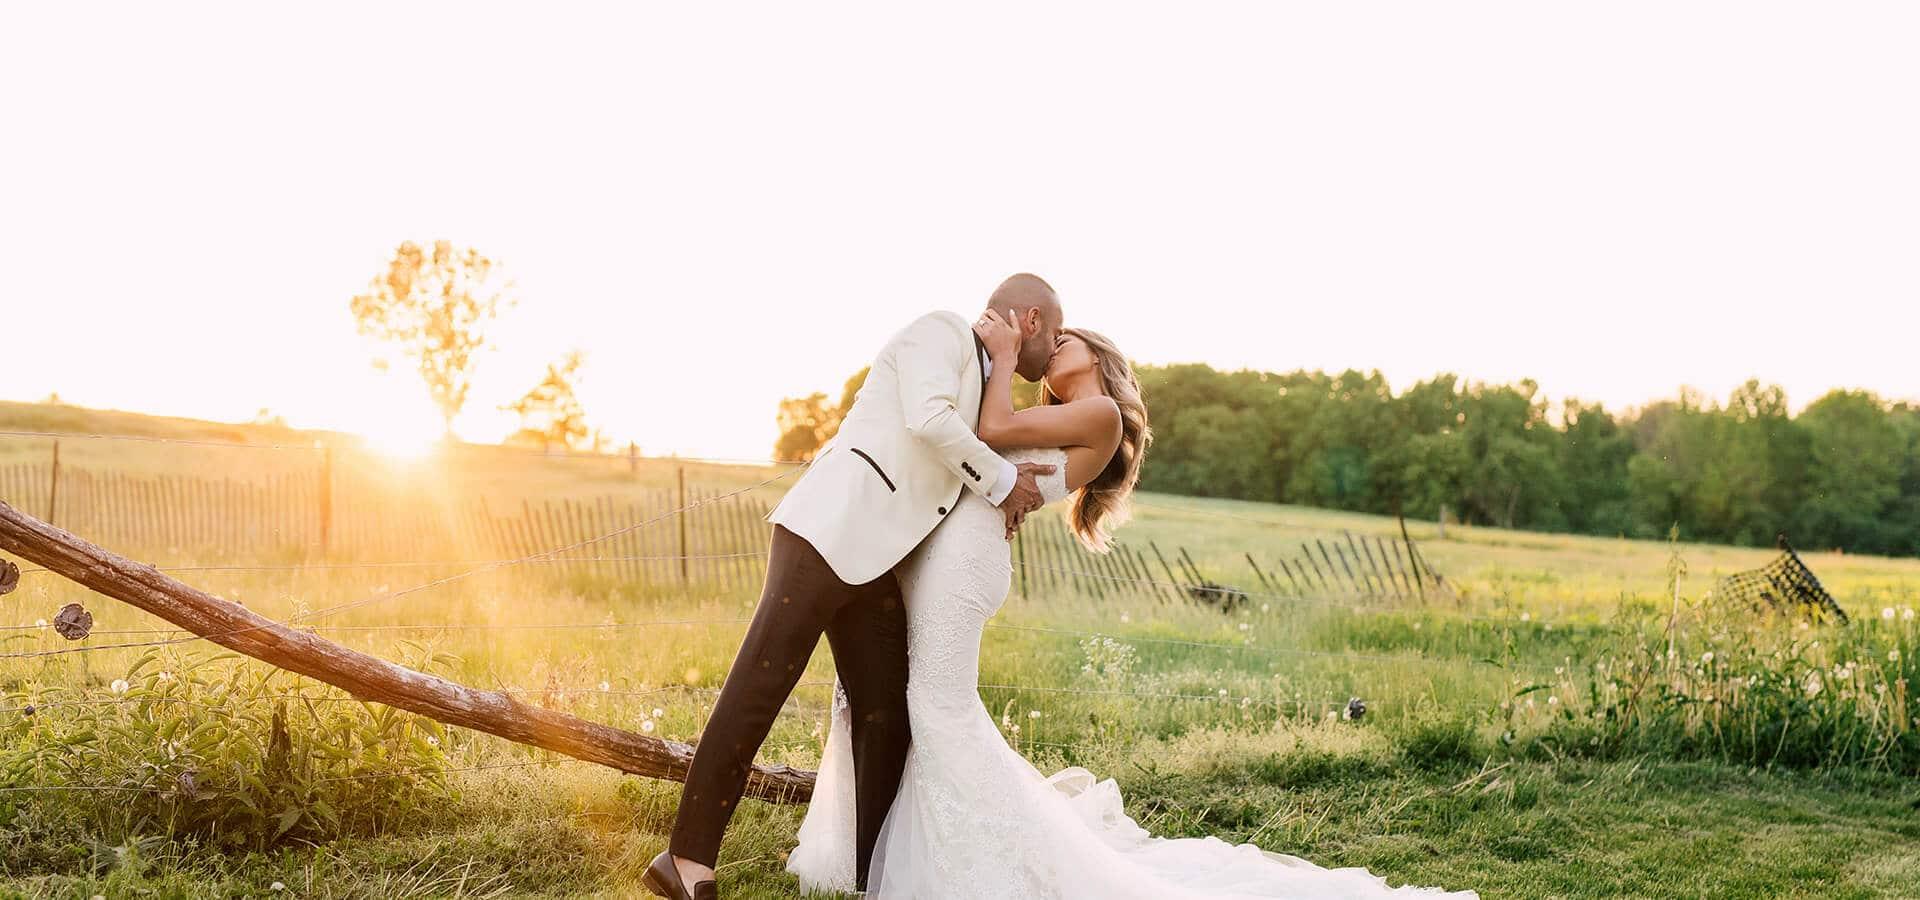 Hero image for Linda and Amir's Stunning Lilac Farm Wedding